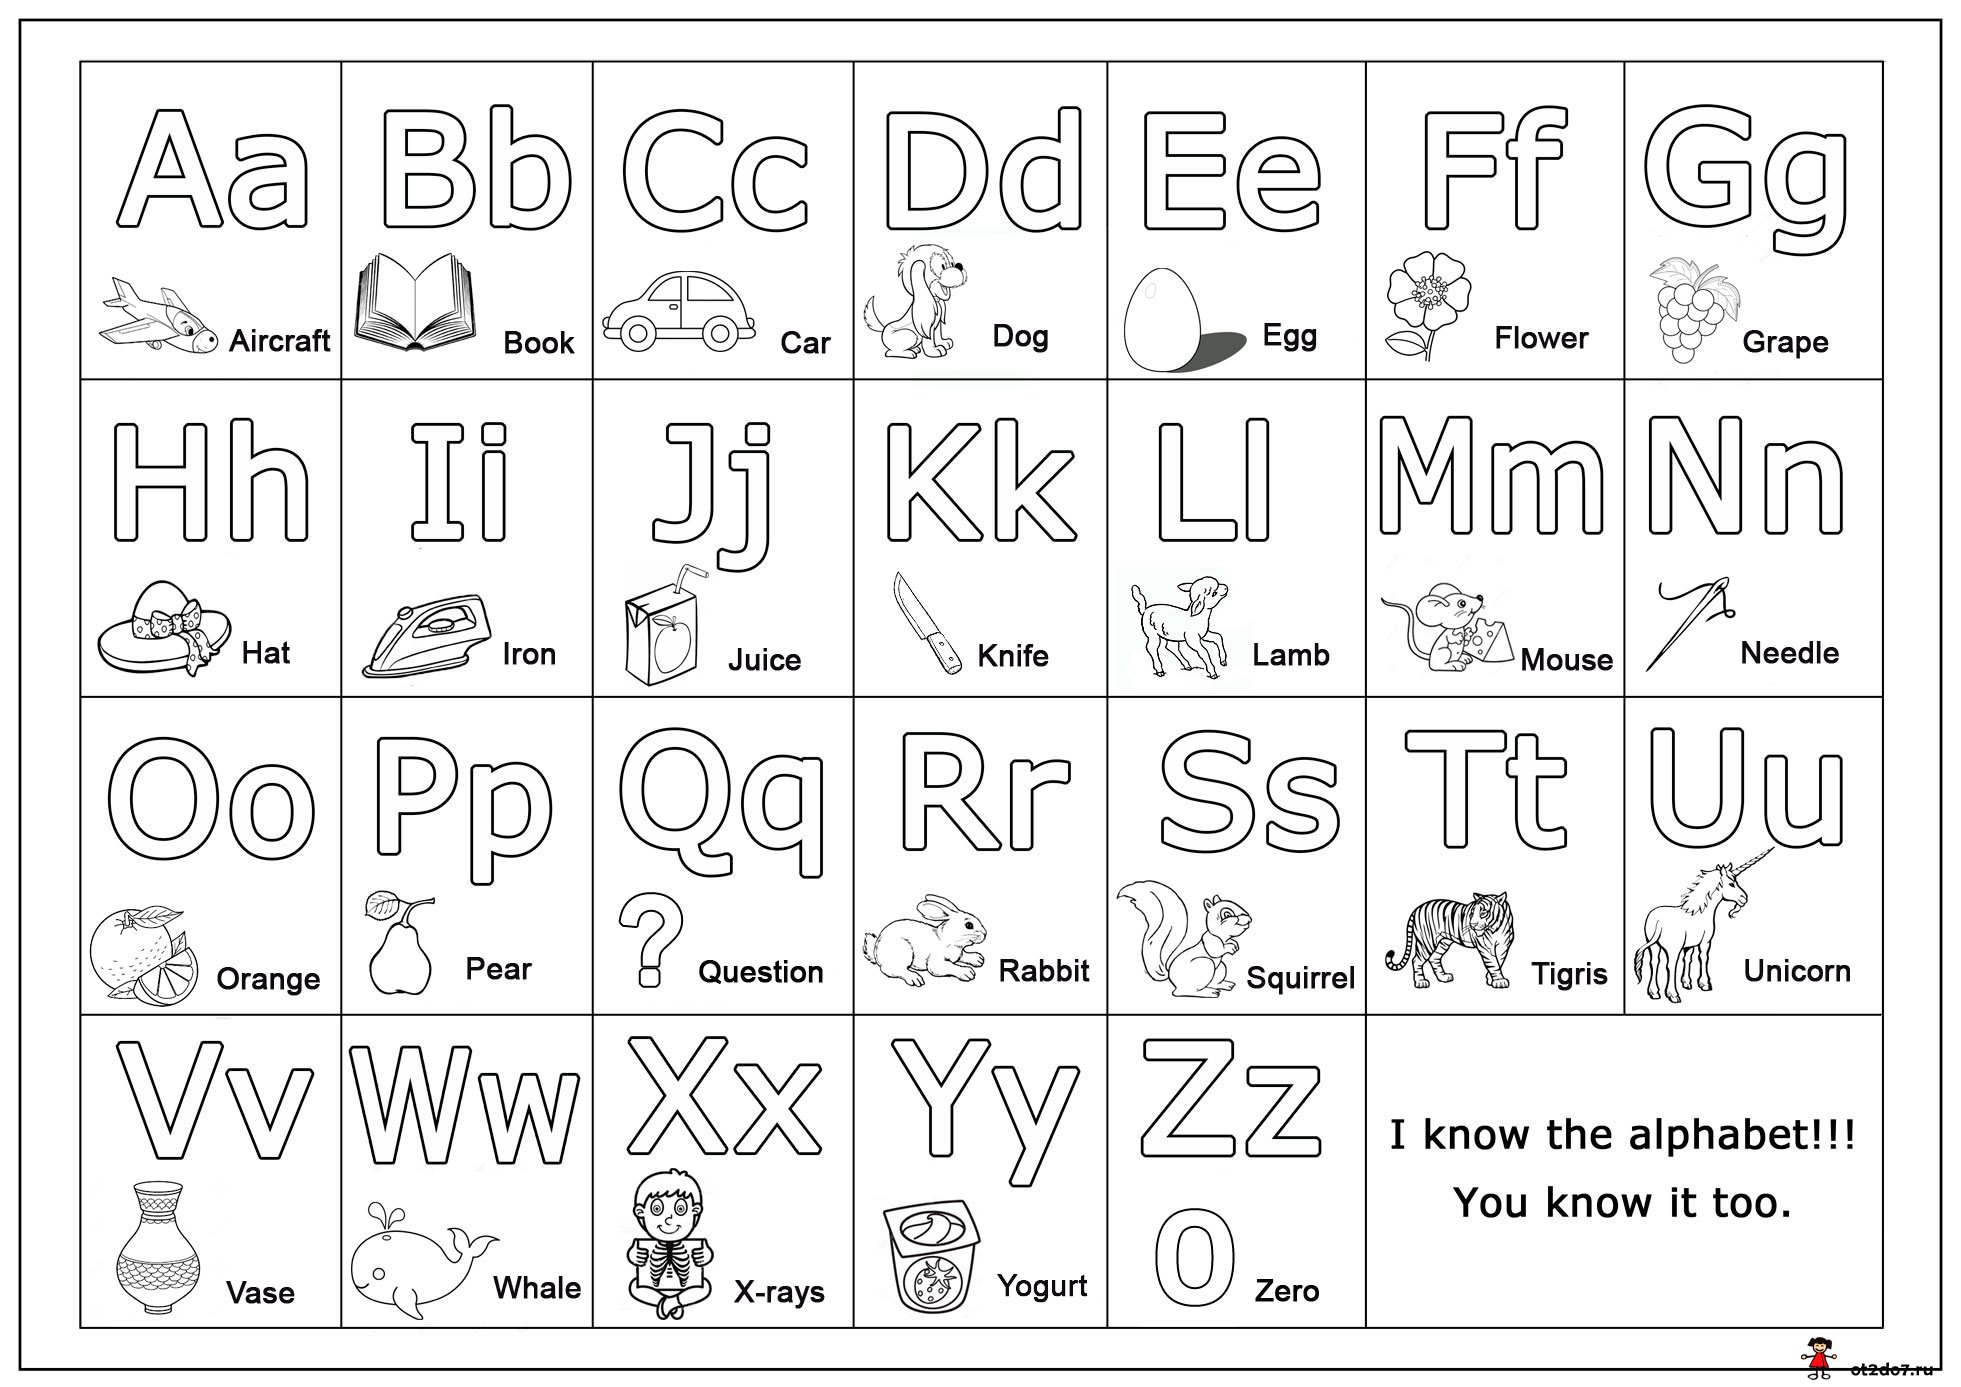 Черно белые картинки английского алфавита